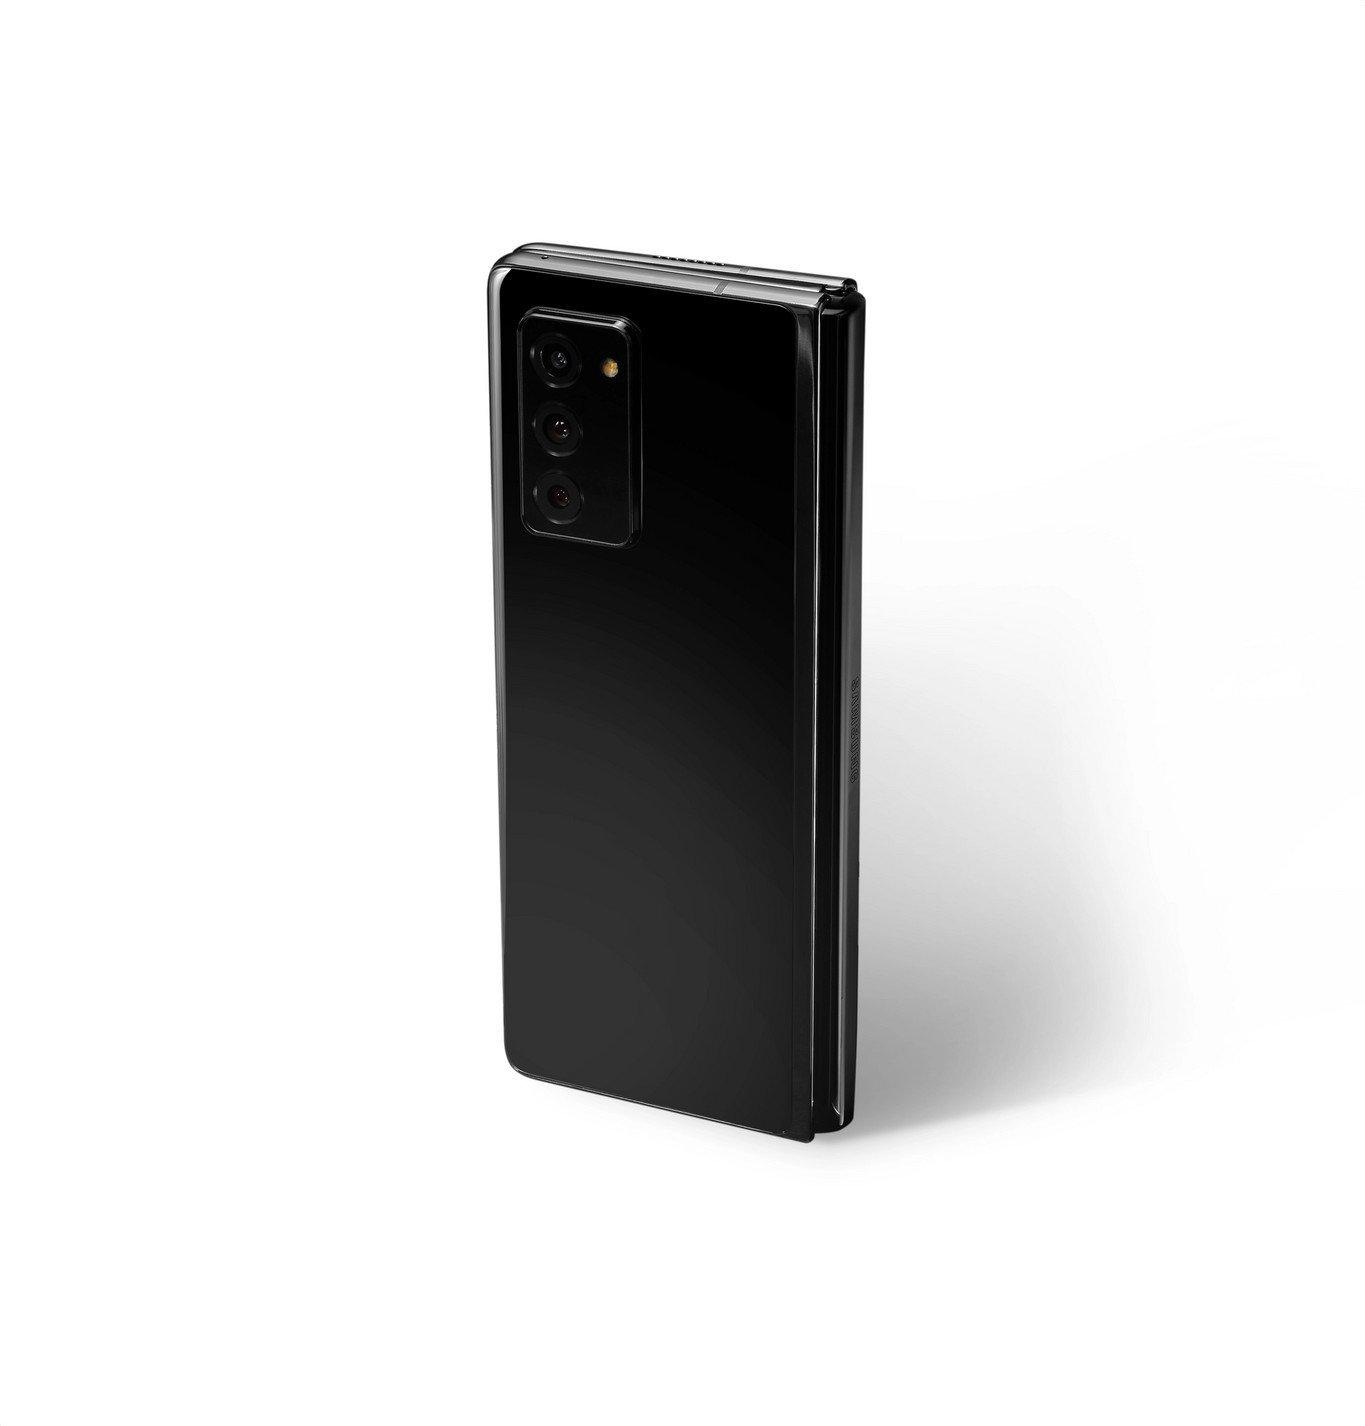 Samsung Galaxy Z Fold2 5G - Silver